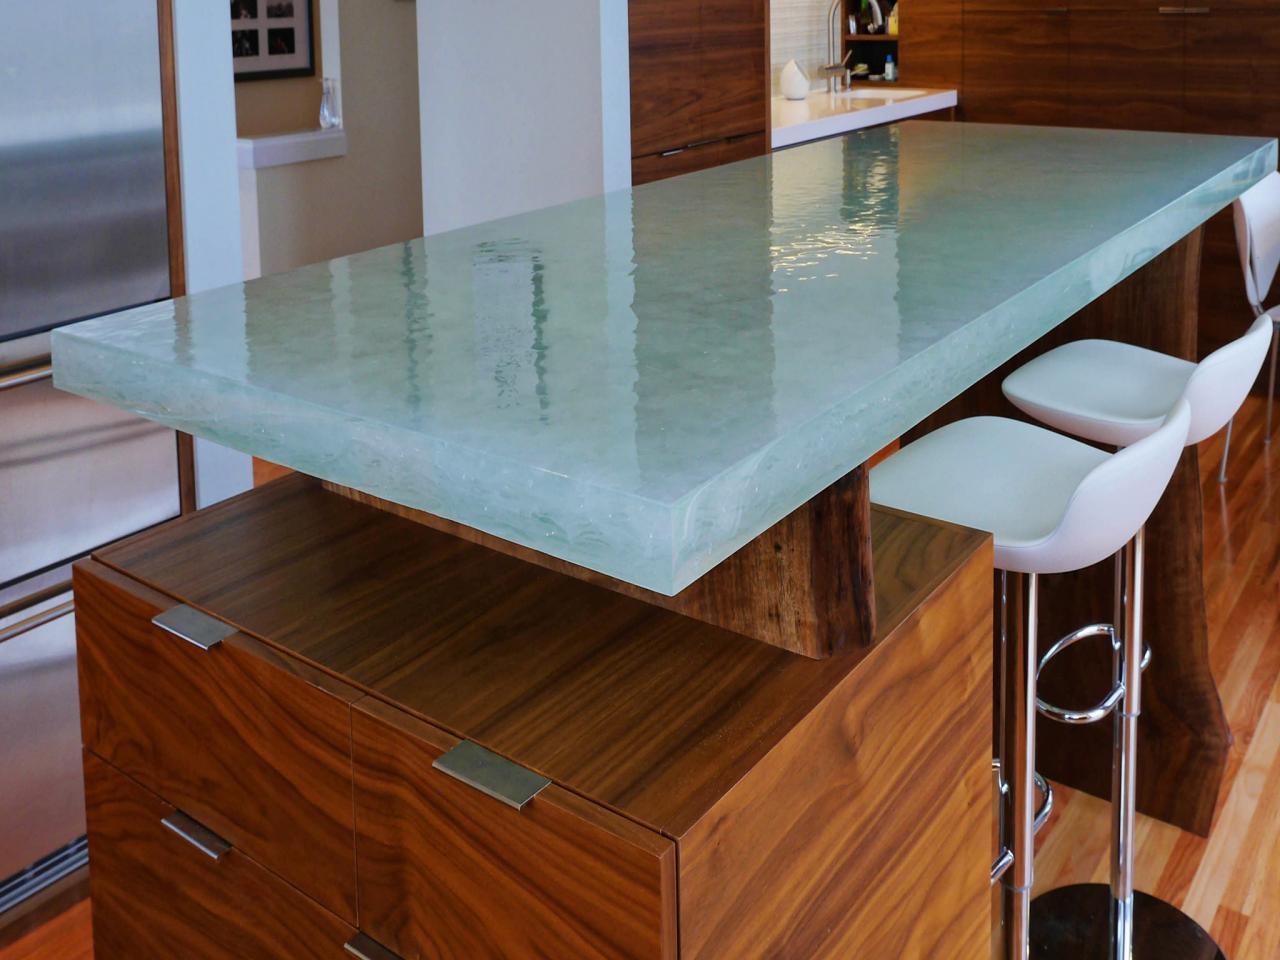 original_glassworks-glas-køkken-bordplade-jpg-rend-hgtvcom-1280-960